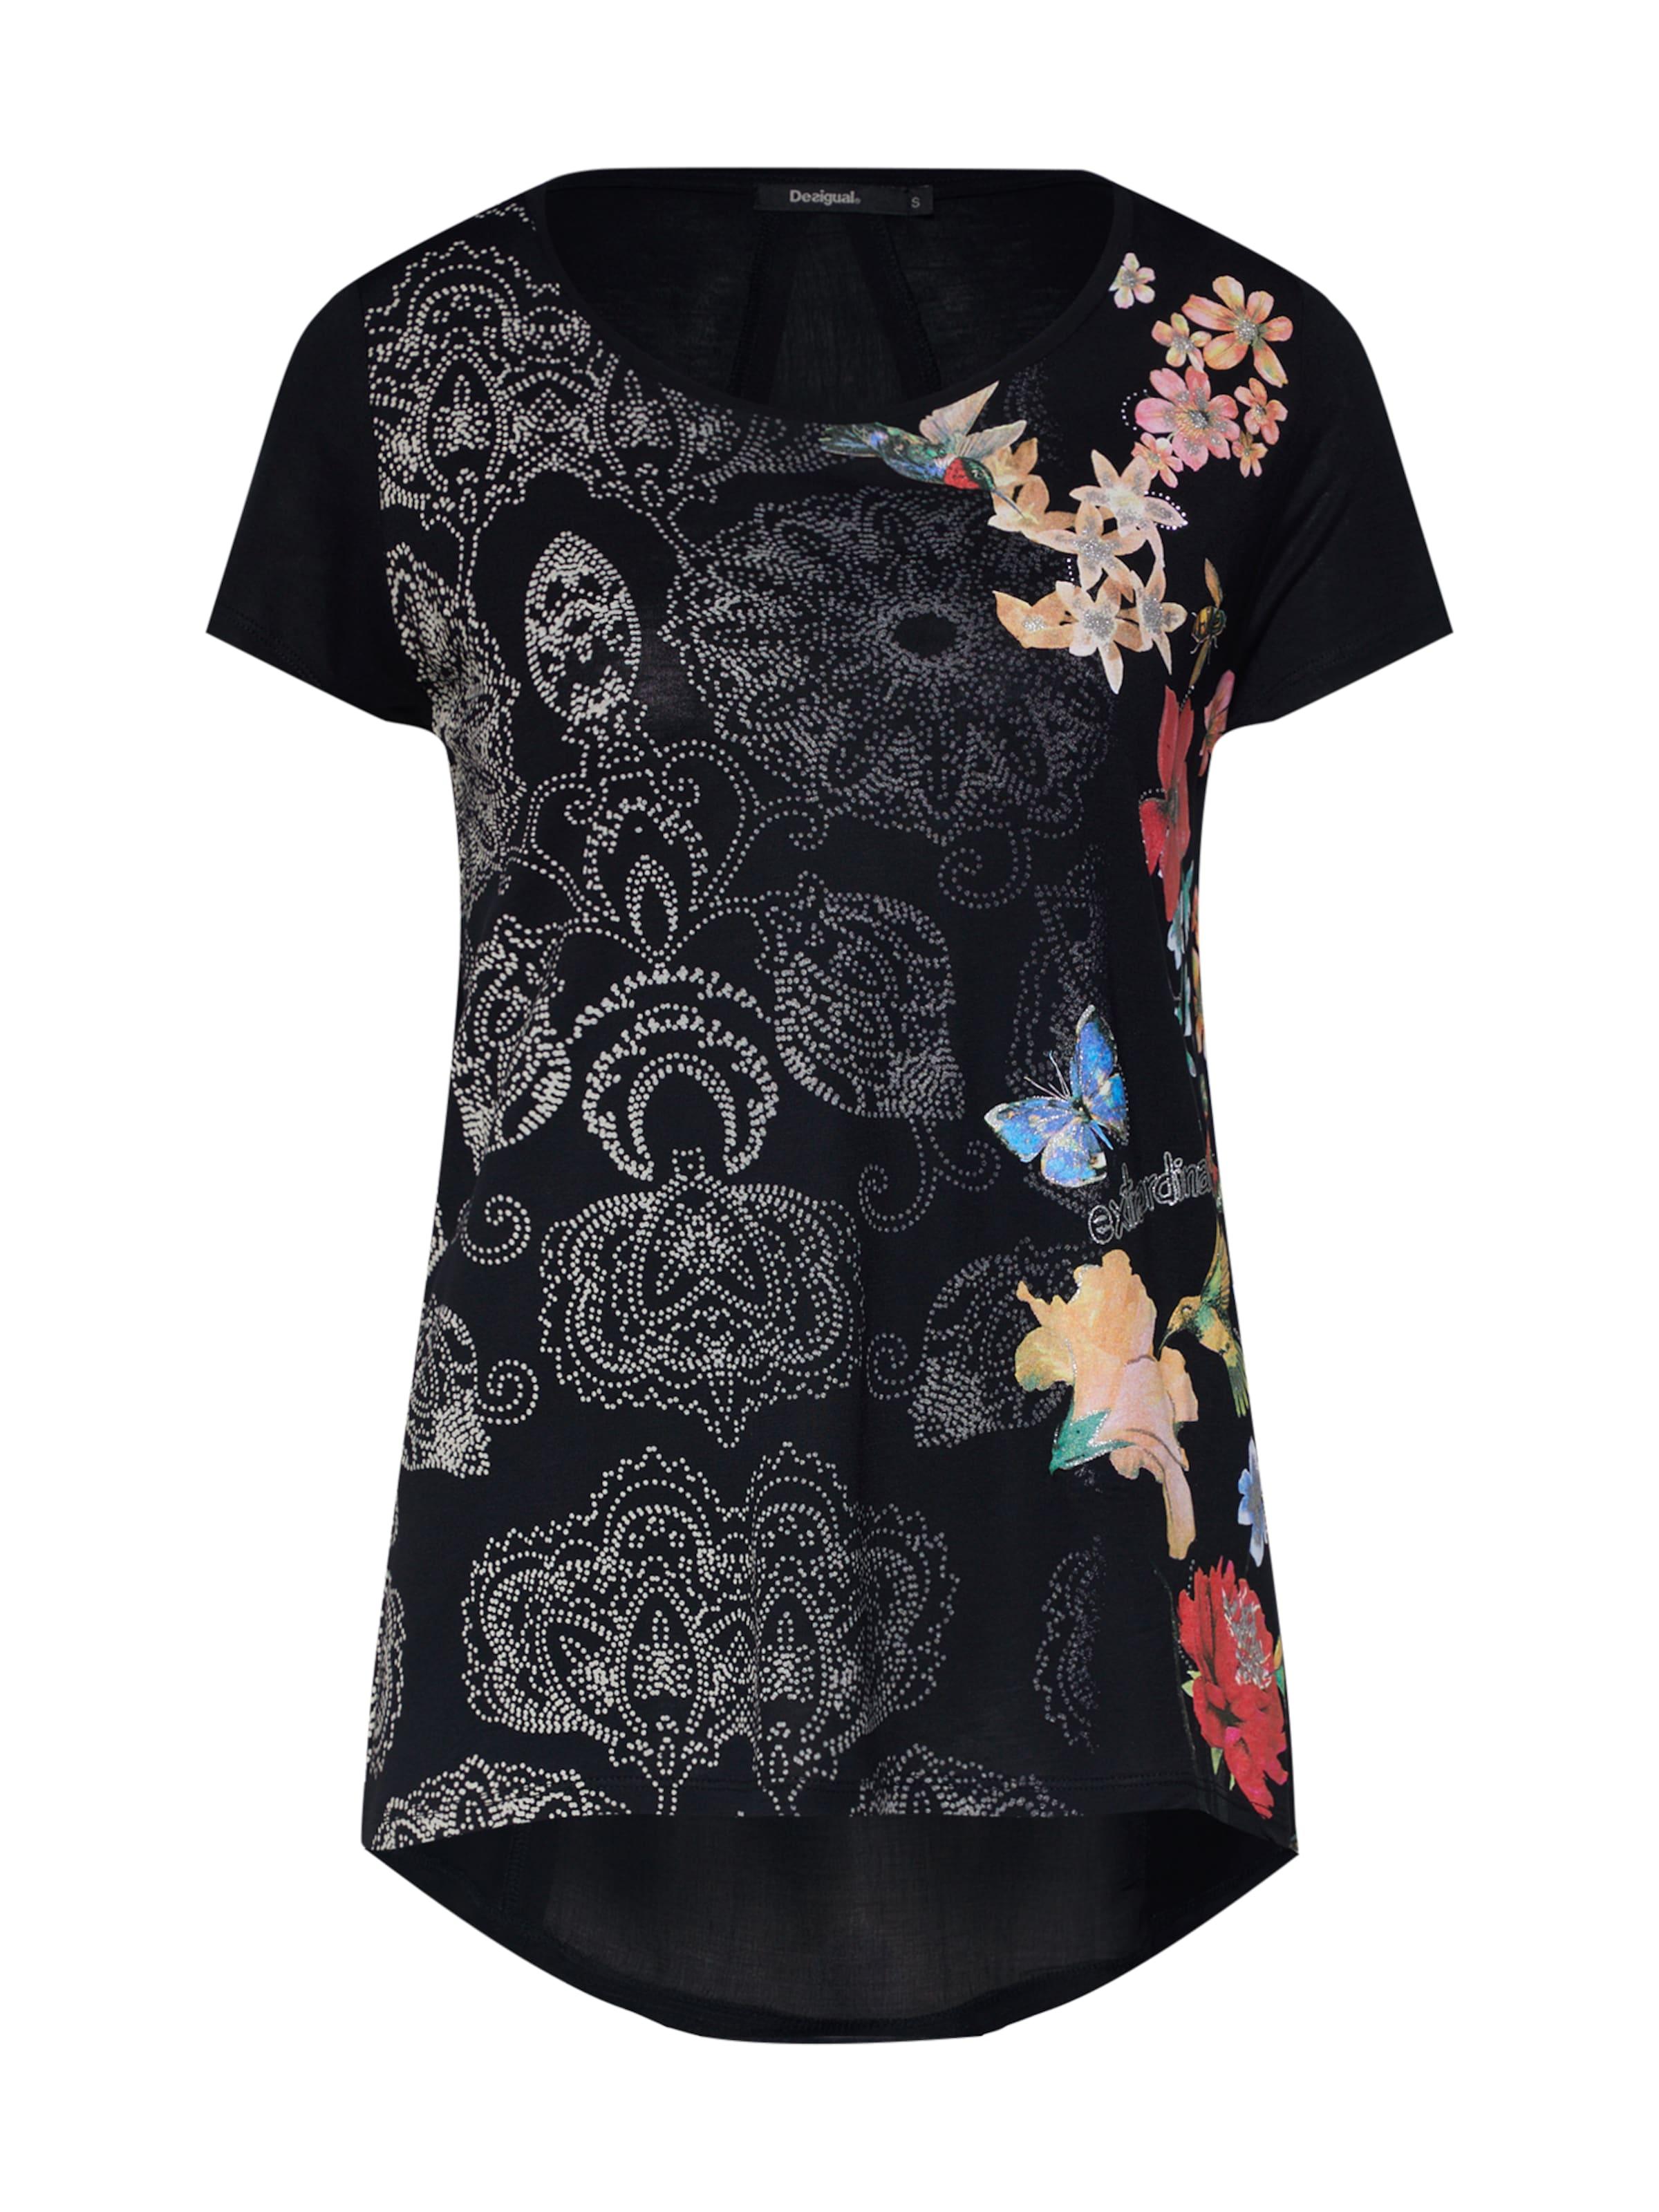 Noir In shirt 'ts panama' DesigualT BdtQxhsrC